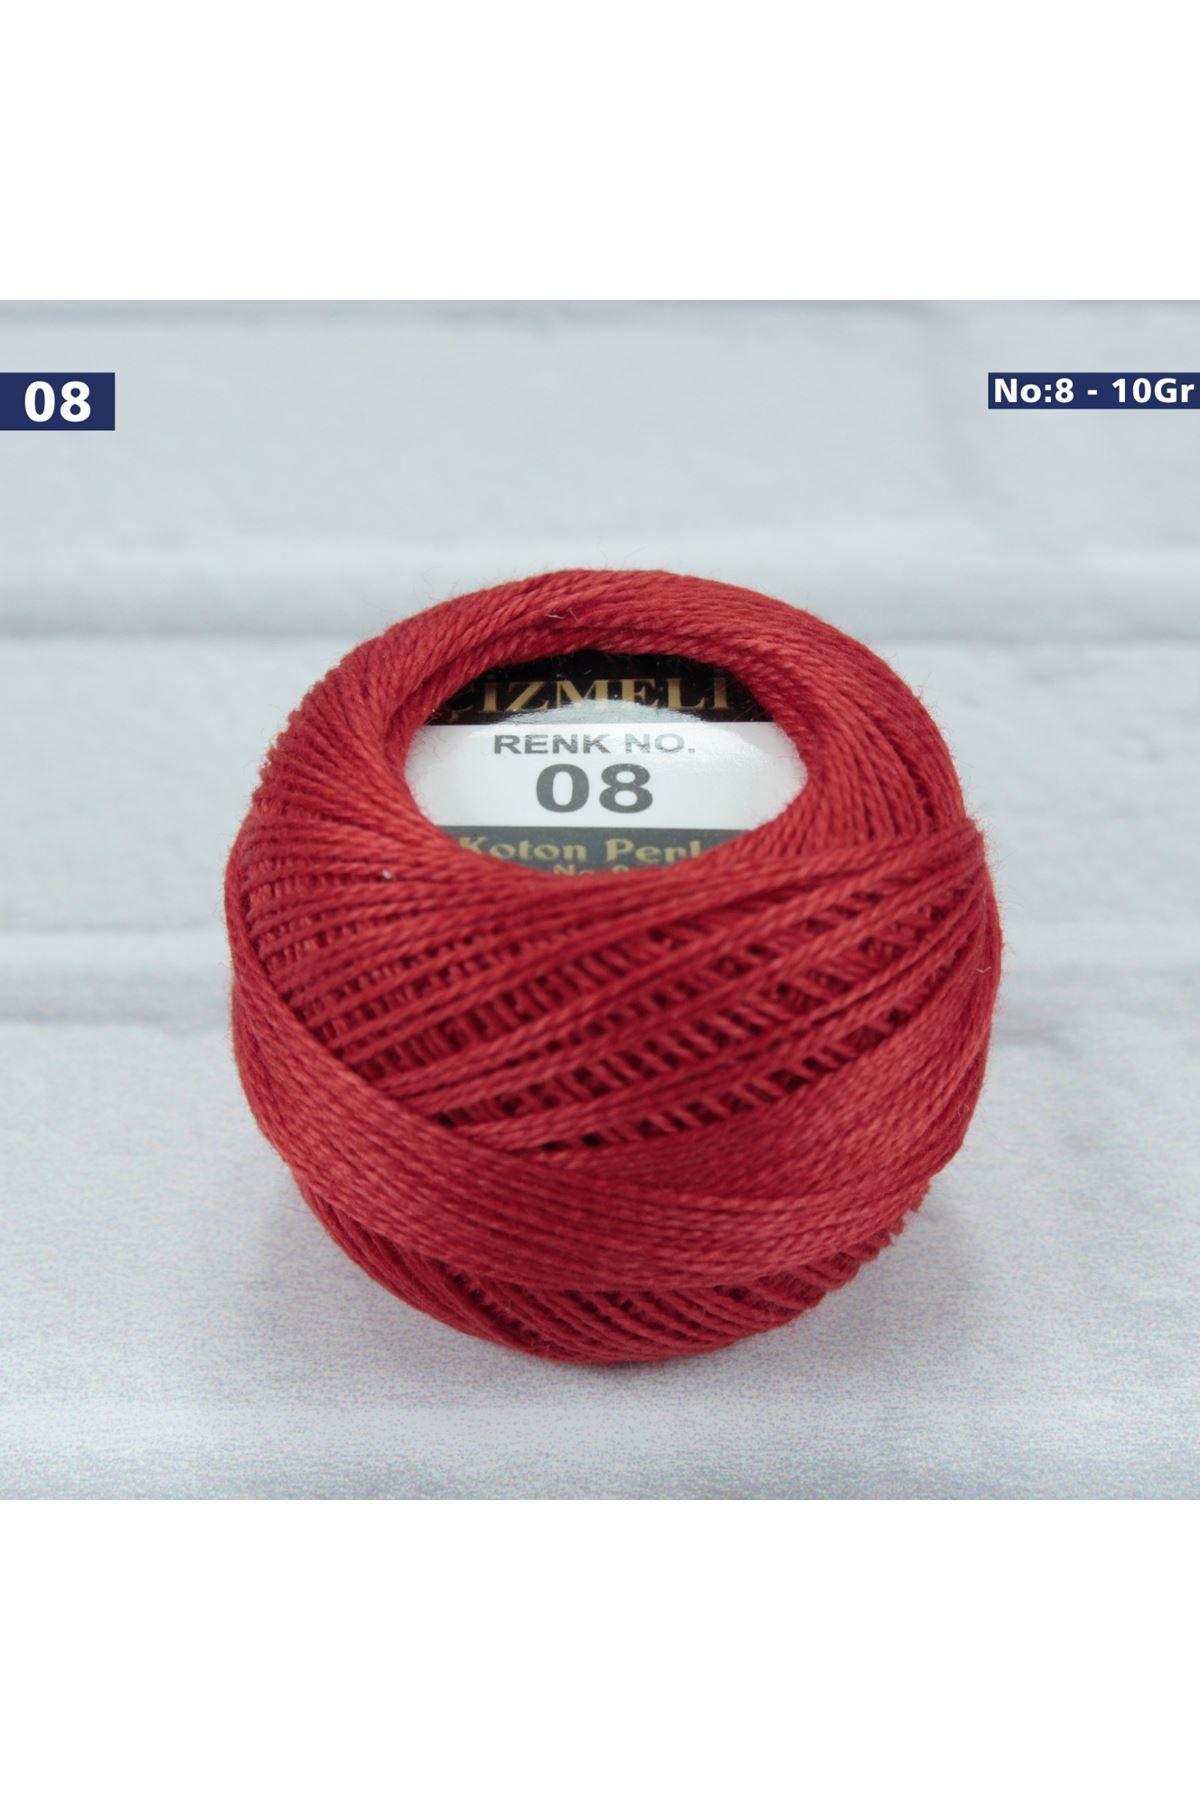 Çizmeli Cotton Perle Nakış İpliği No: 008